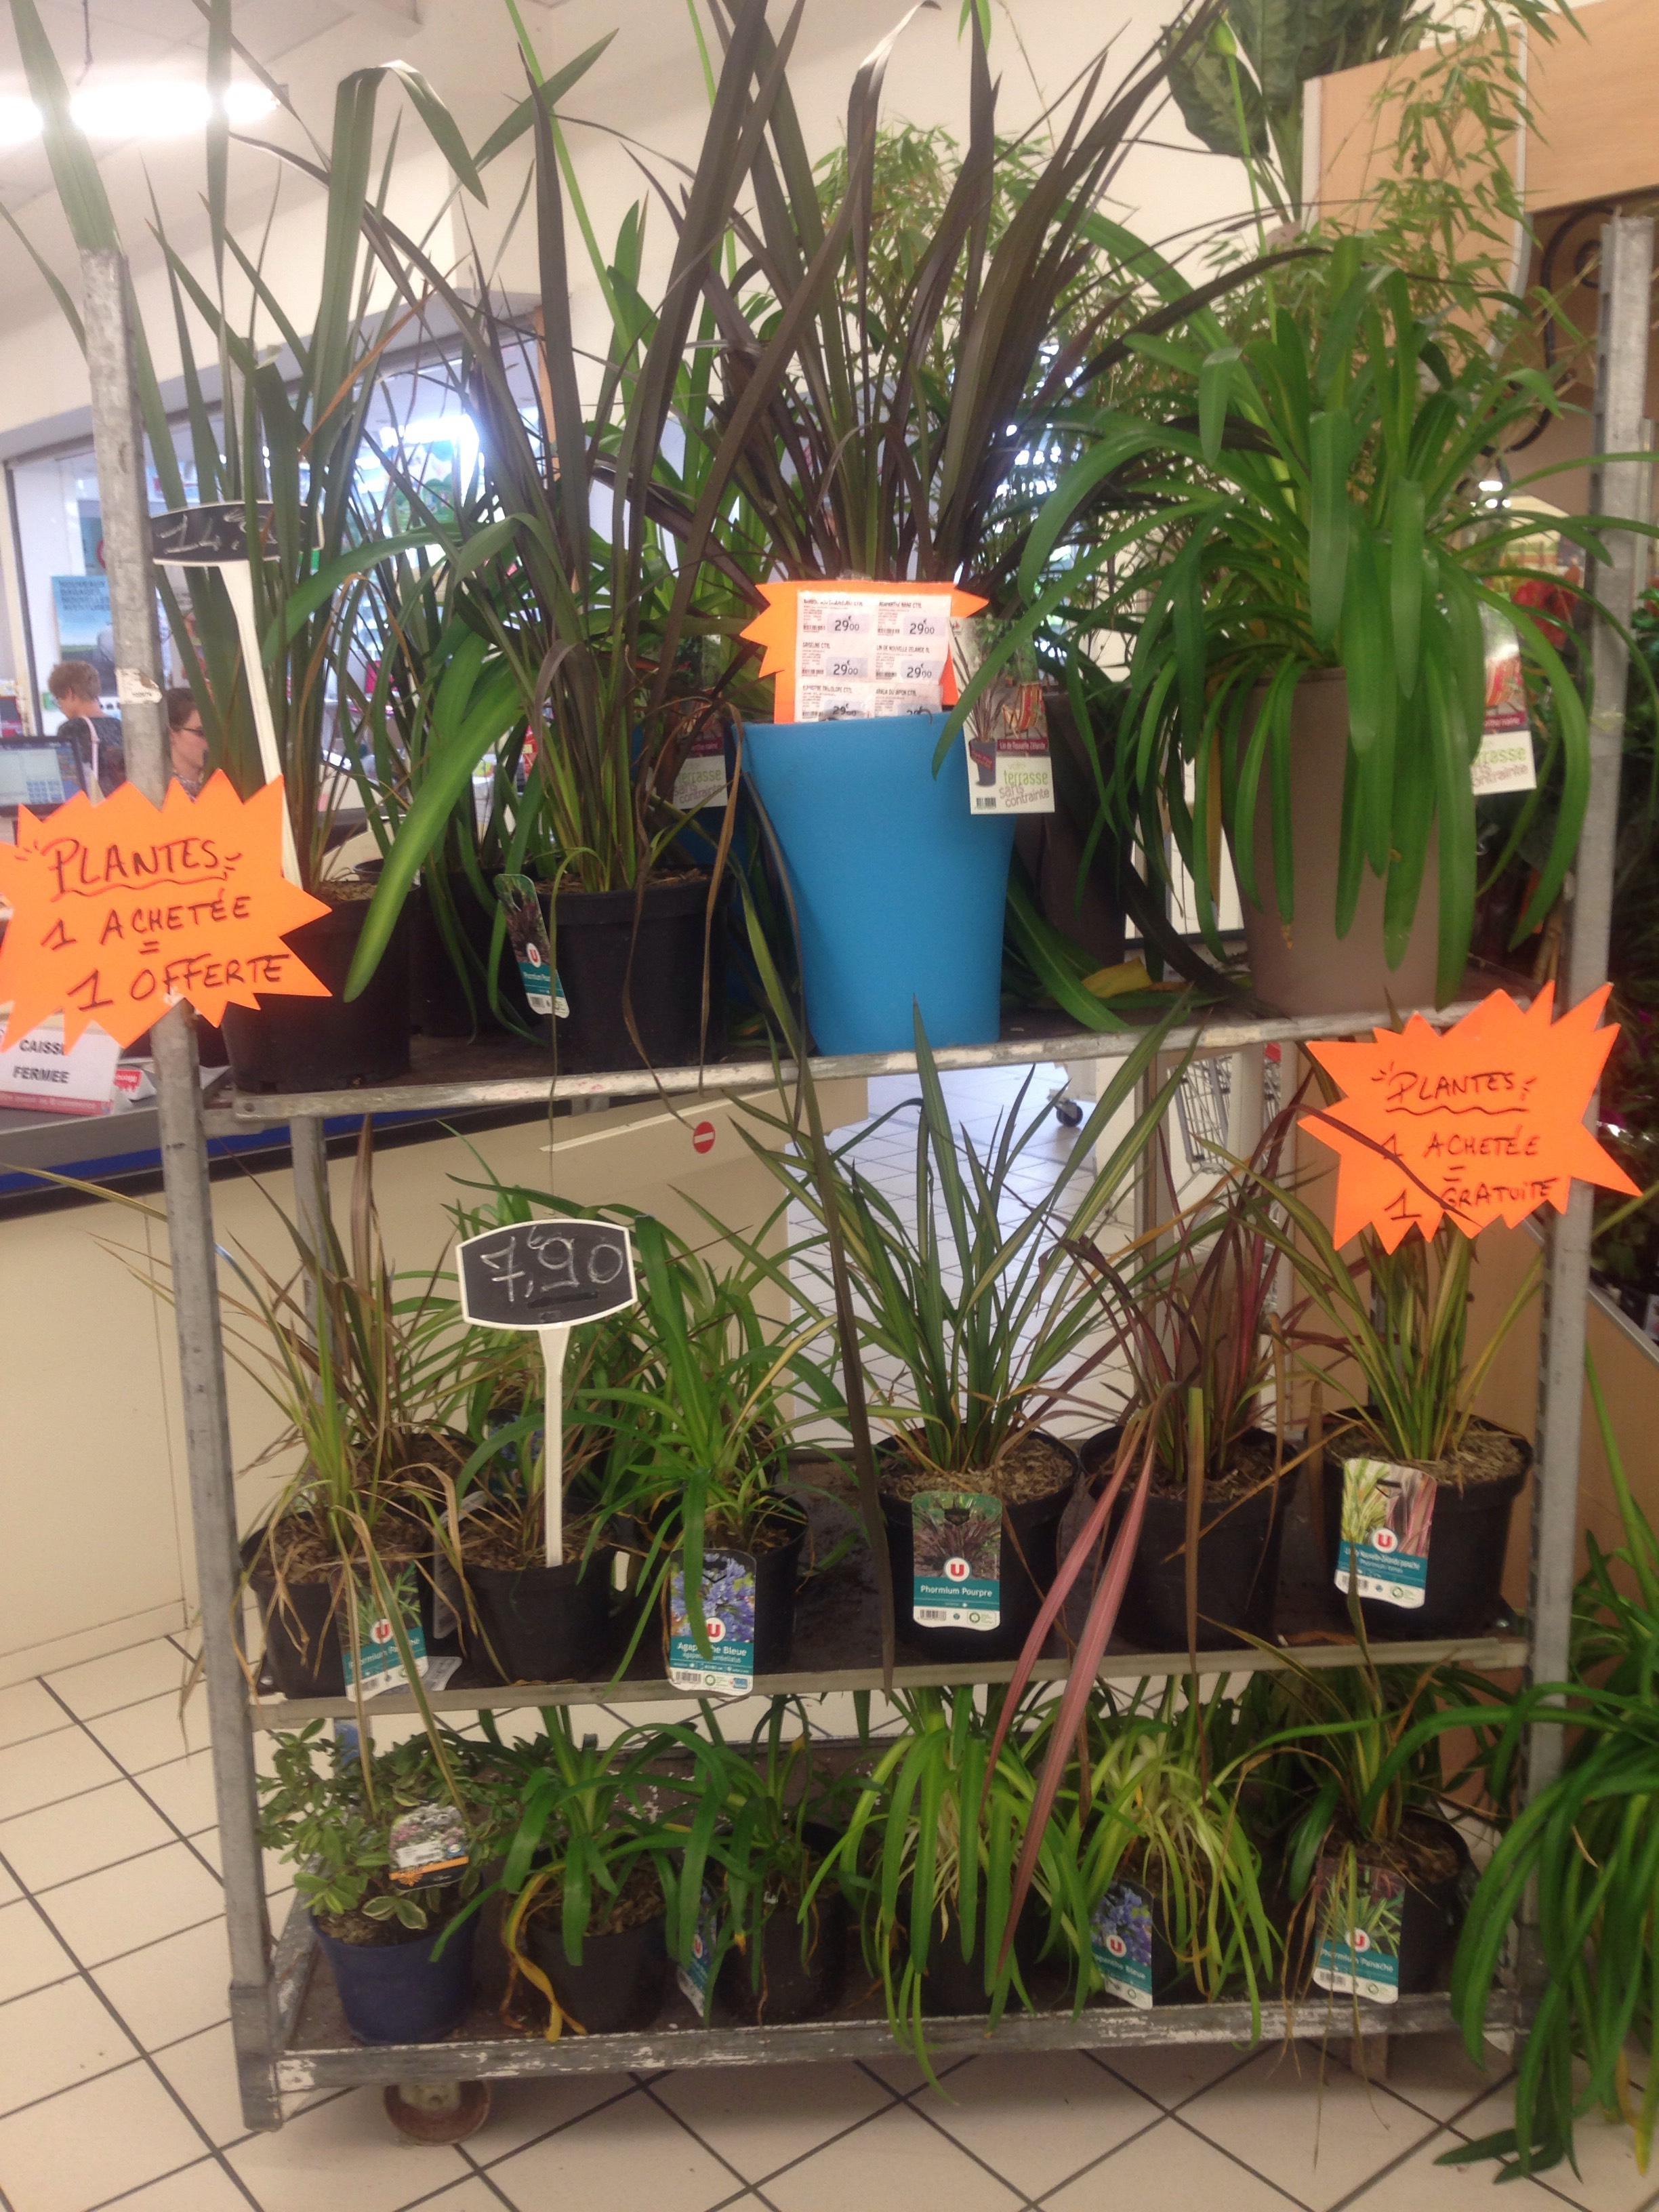 1 plante acheté = 1 plante offerte